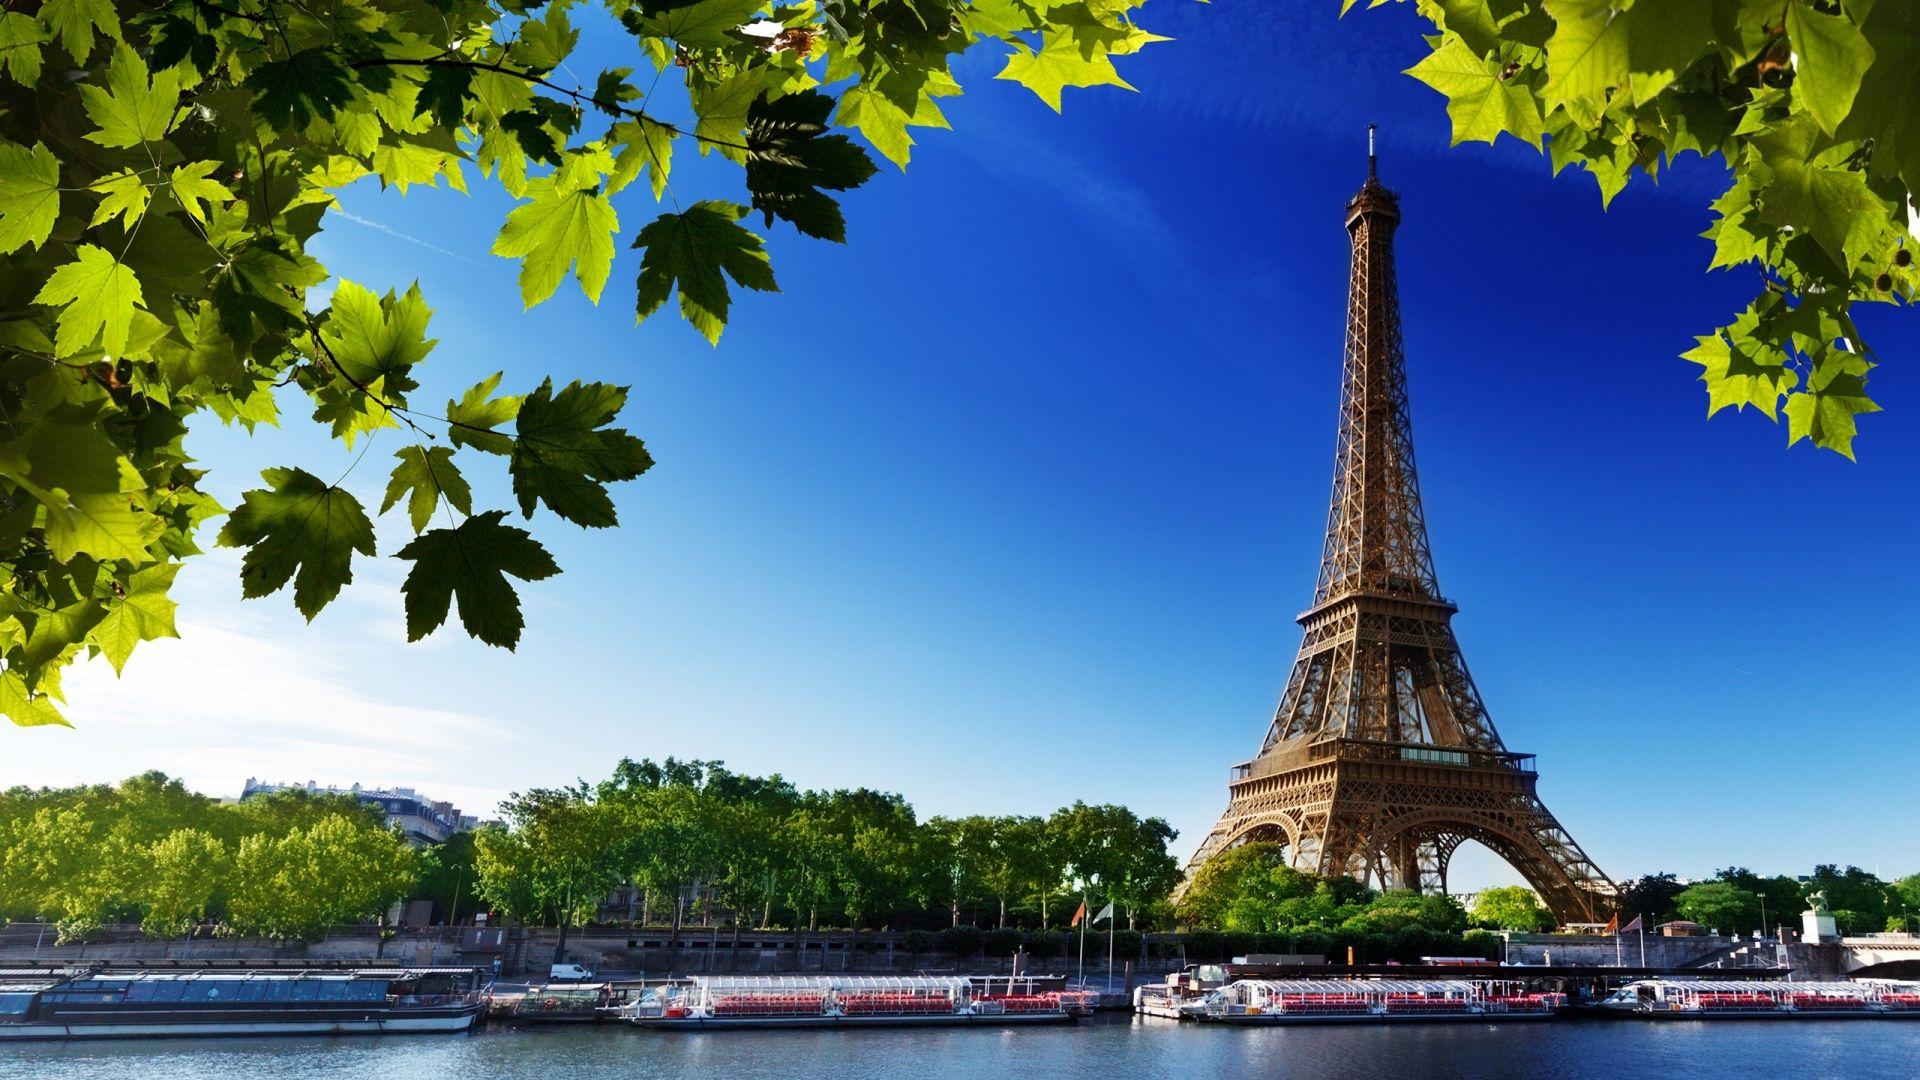 Download Wallpaper 1920x1080 Paris Eiffel Tower France River Beach Trees Full Hd 1080p Hd Backgrou Eiffel Tower Paris Wallpaper Best Vacation Destinations Full hd eiffel tower wallpaper hd 1080p